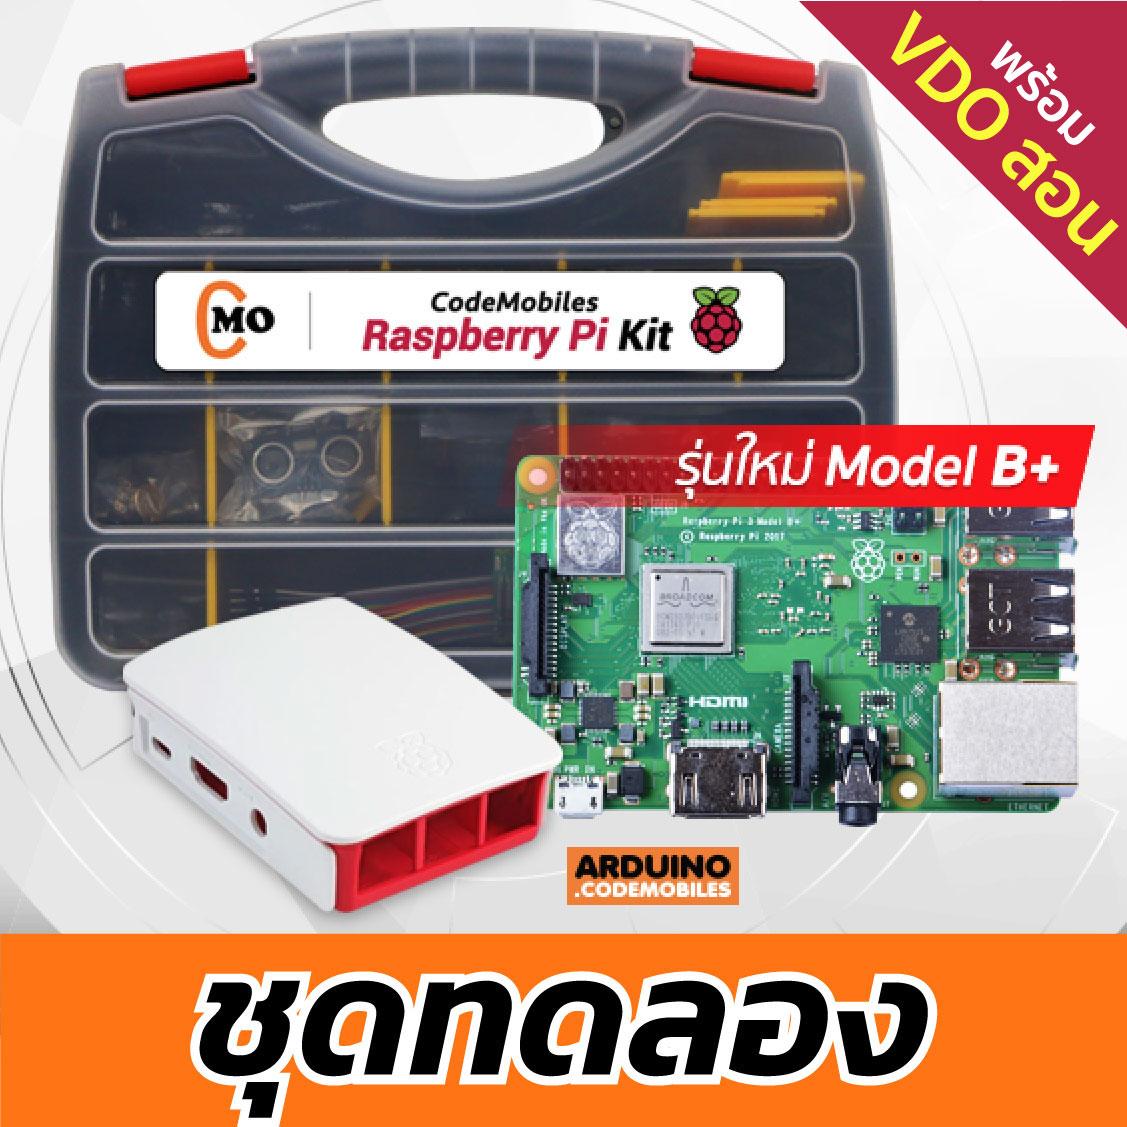 CodeMobiles Raspberry Pi Kit พร้อม วีดีโอสอน+Source Code+ลง OS